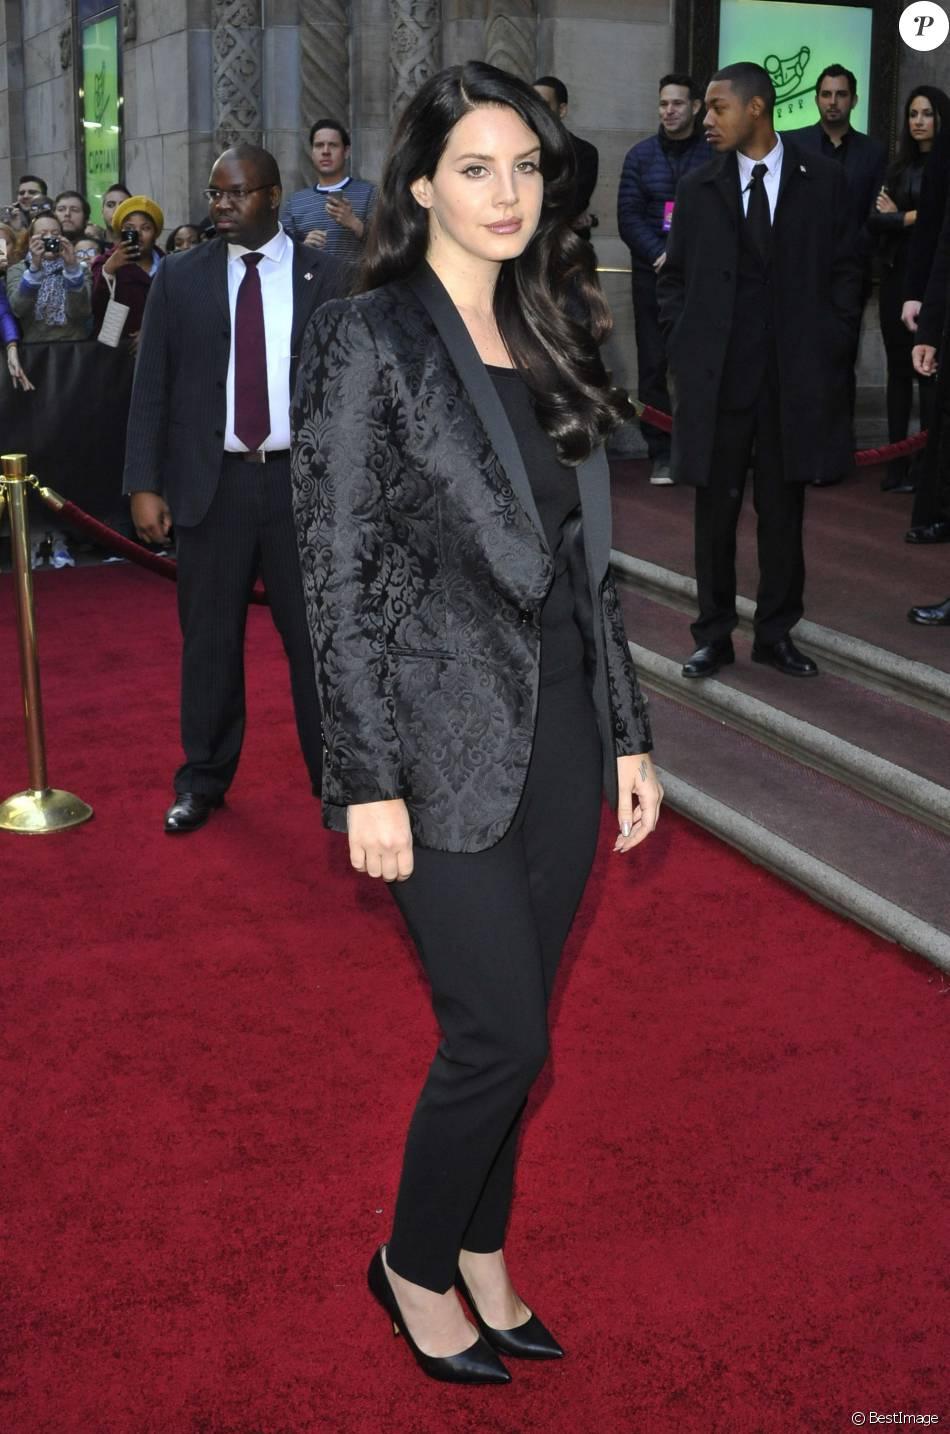 Lana Del Rey -  Soirée Billboard's 10th Annual Women In Music à New York le 11 décembre 2015.